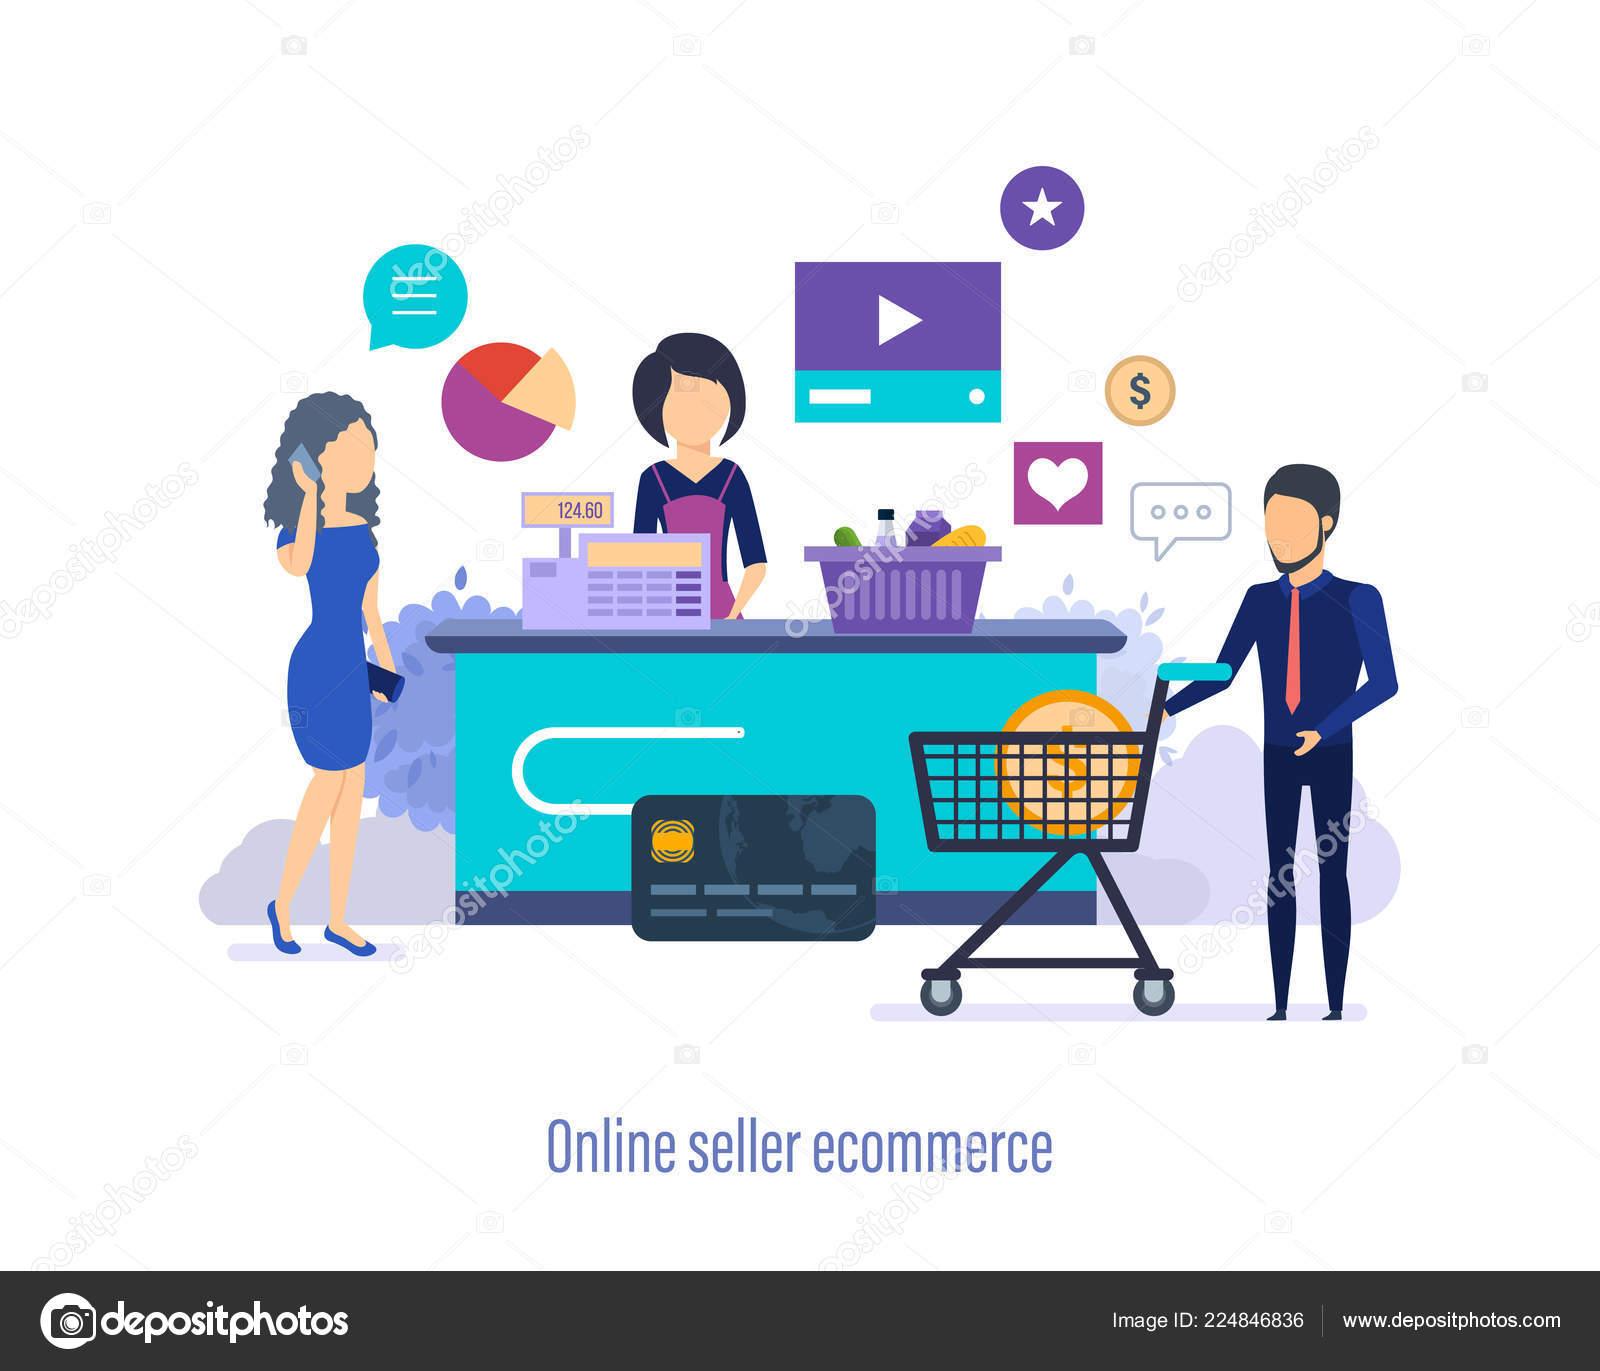 fab20c205f19 Ecommerce online πωλητή. Ψώνια στο κατάστημα